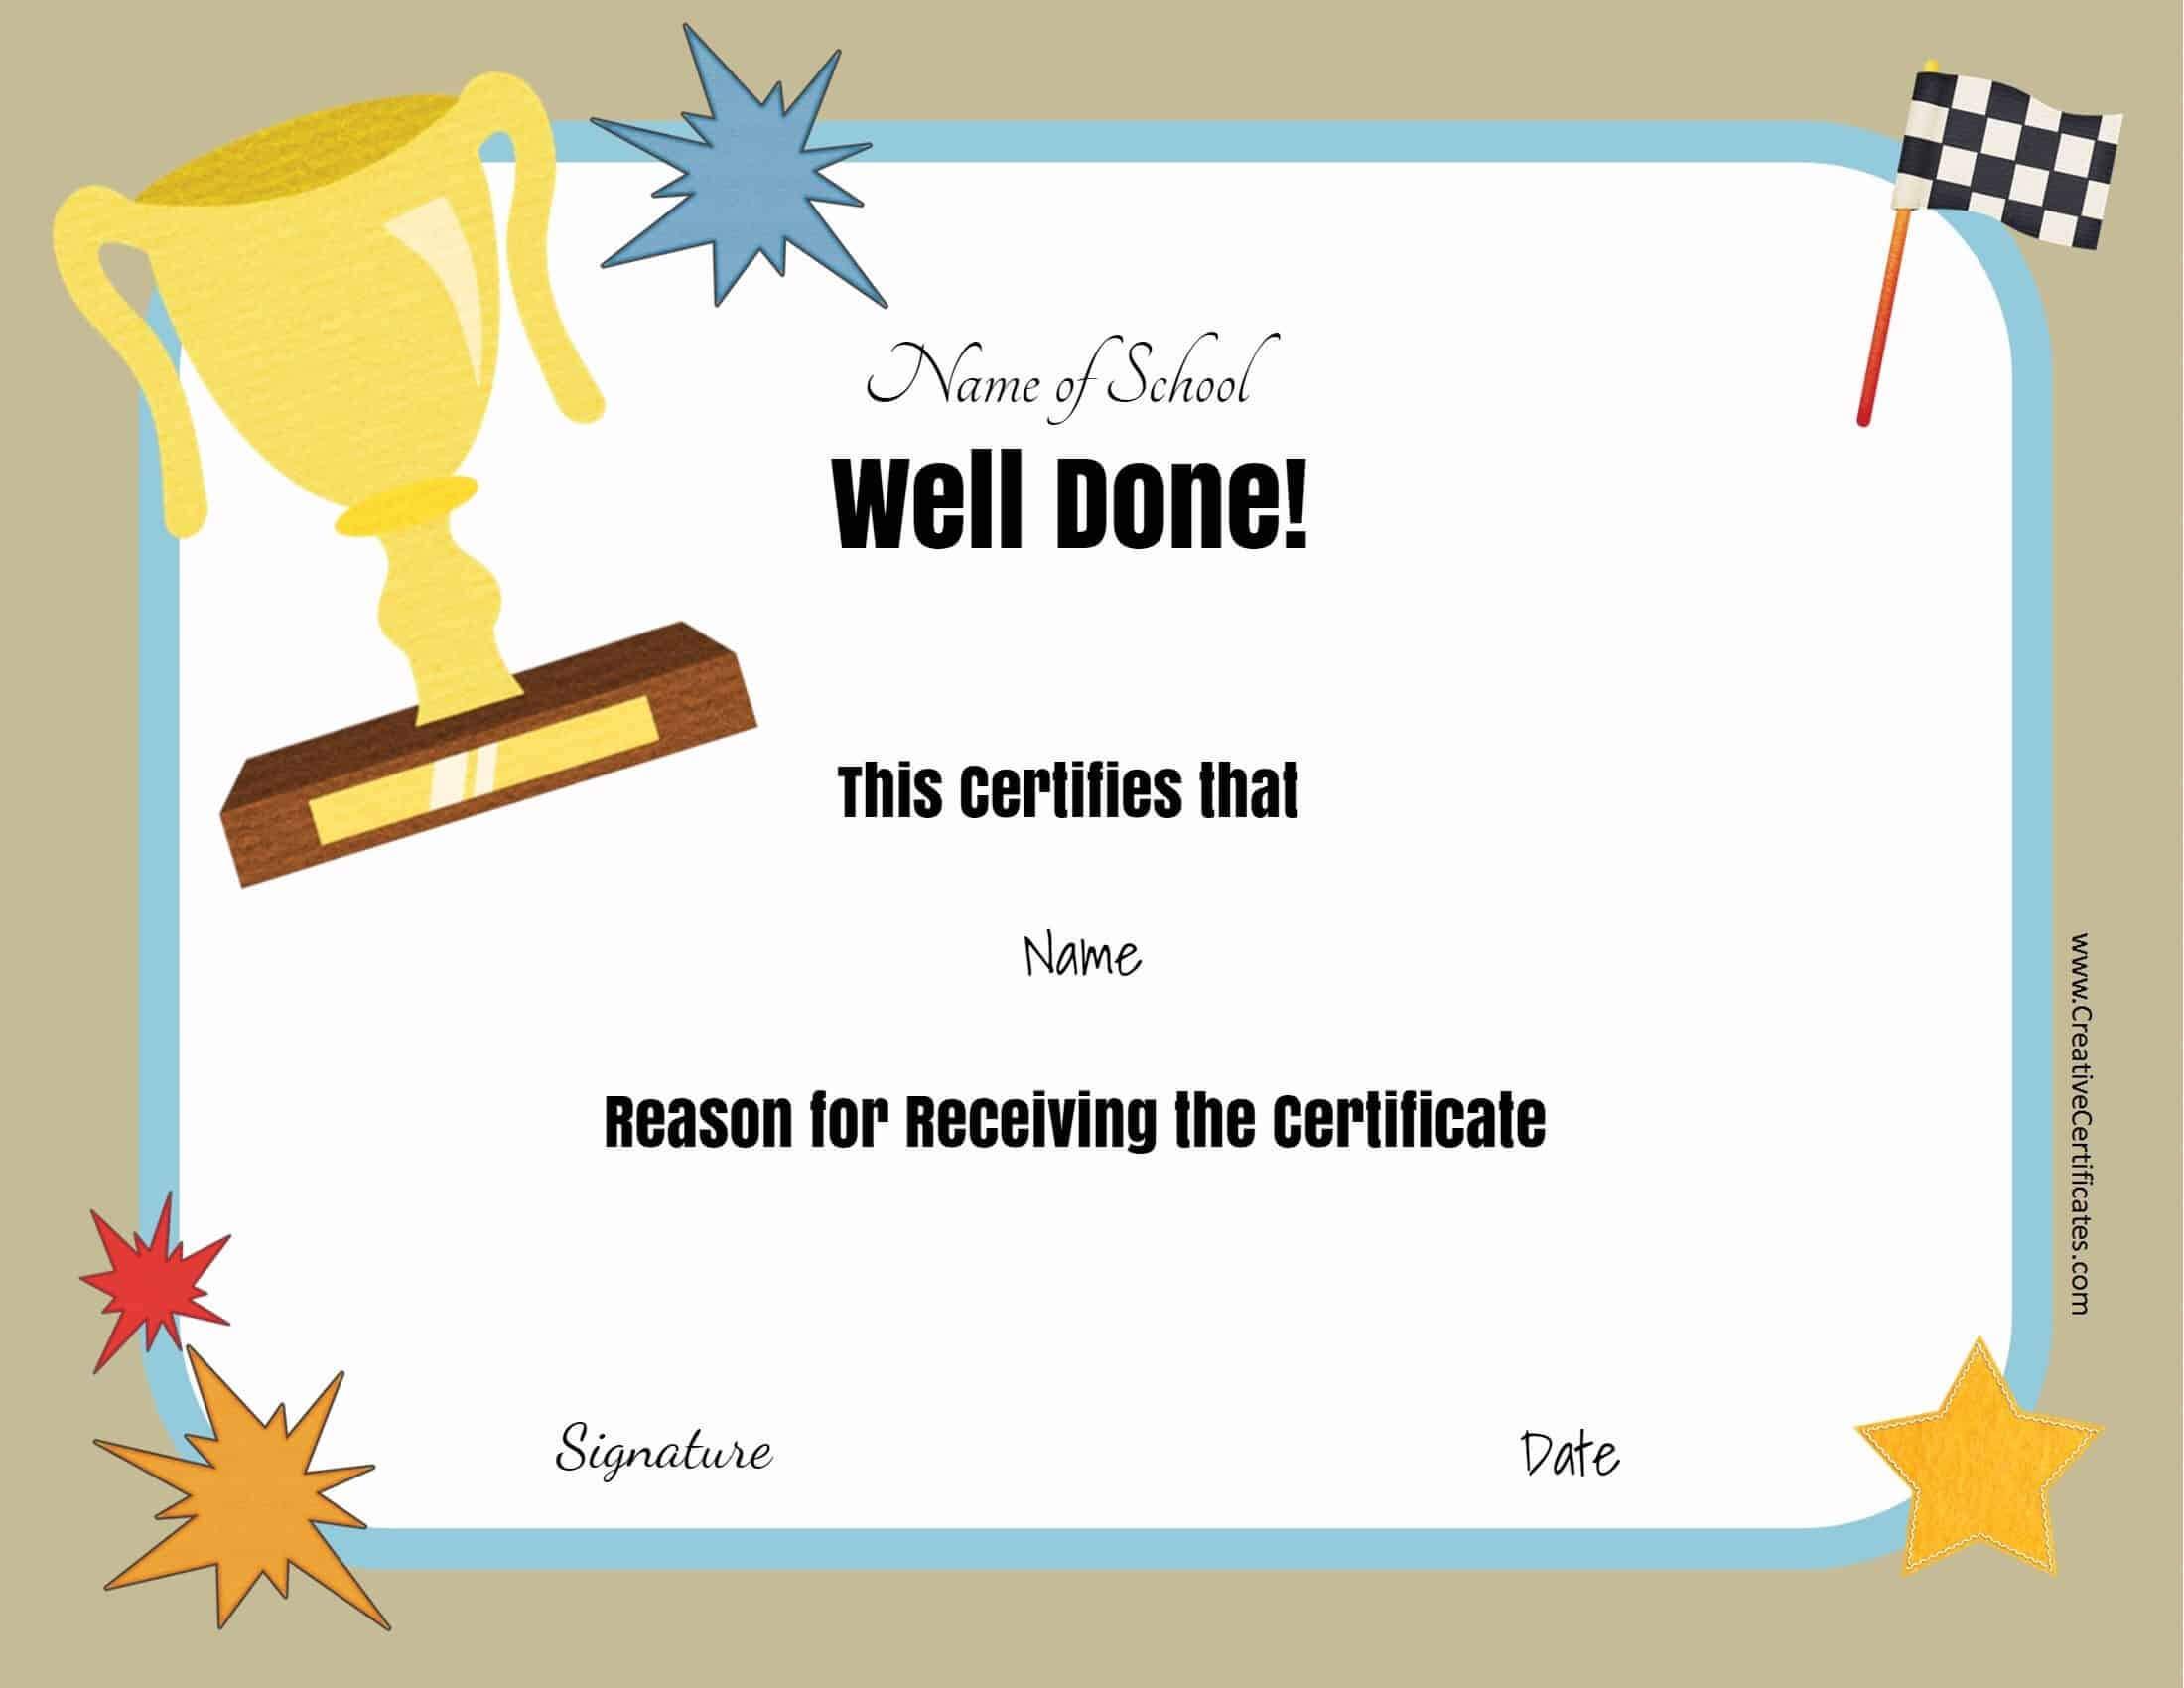 Free School Certificates & Awards With Regard To Free School Certificate Templates